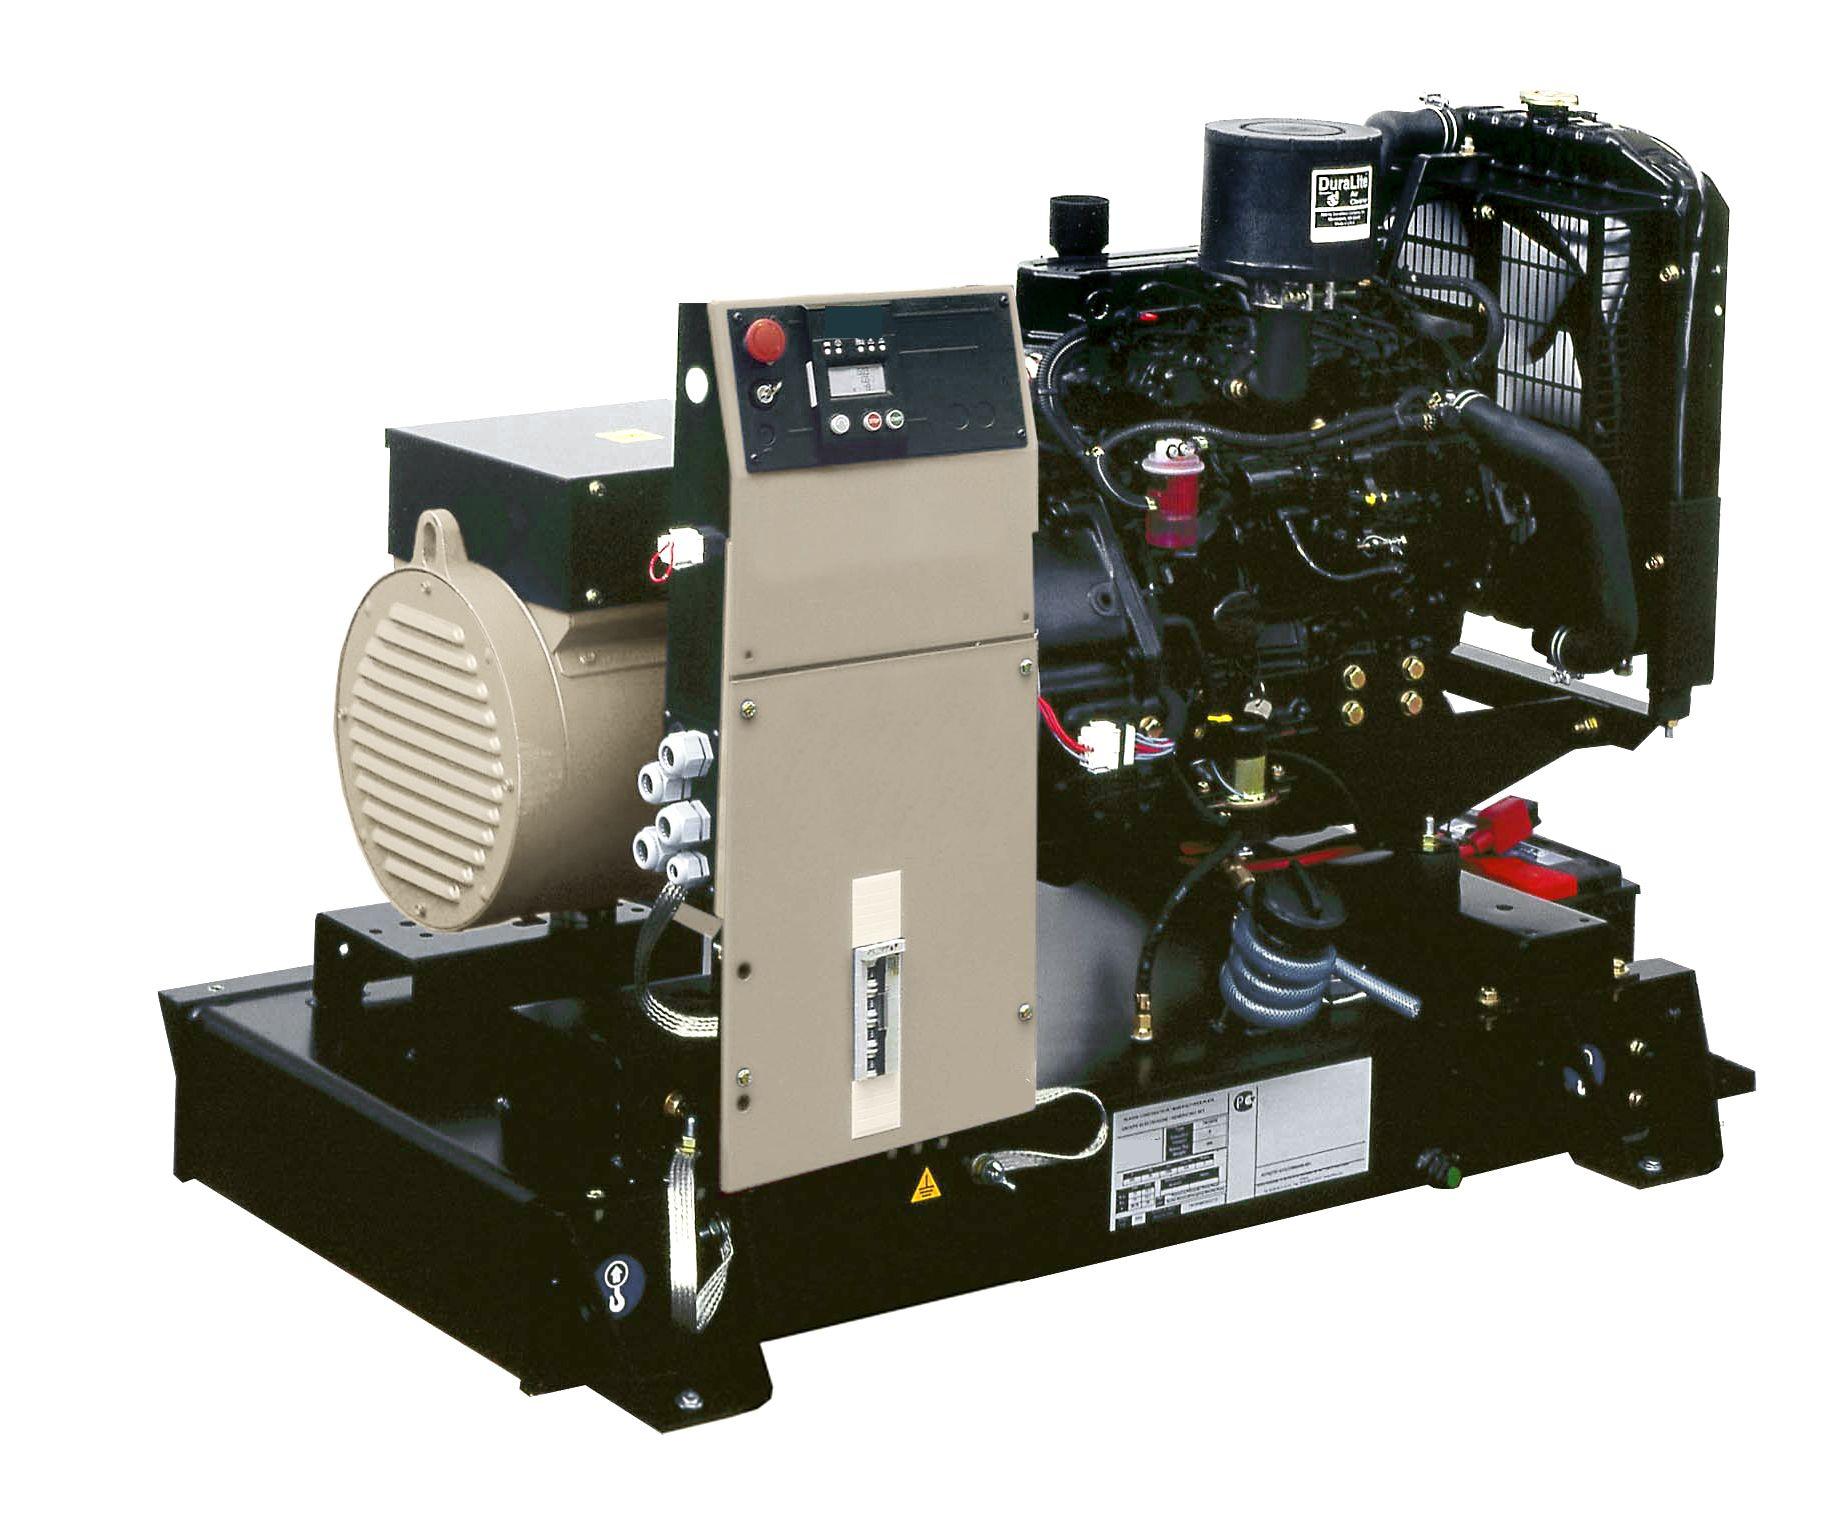 Uninterruptible Power Supply in Data Center What Needs Attention